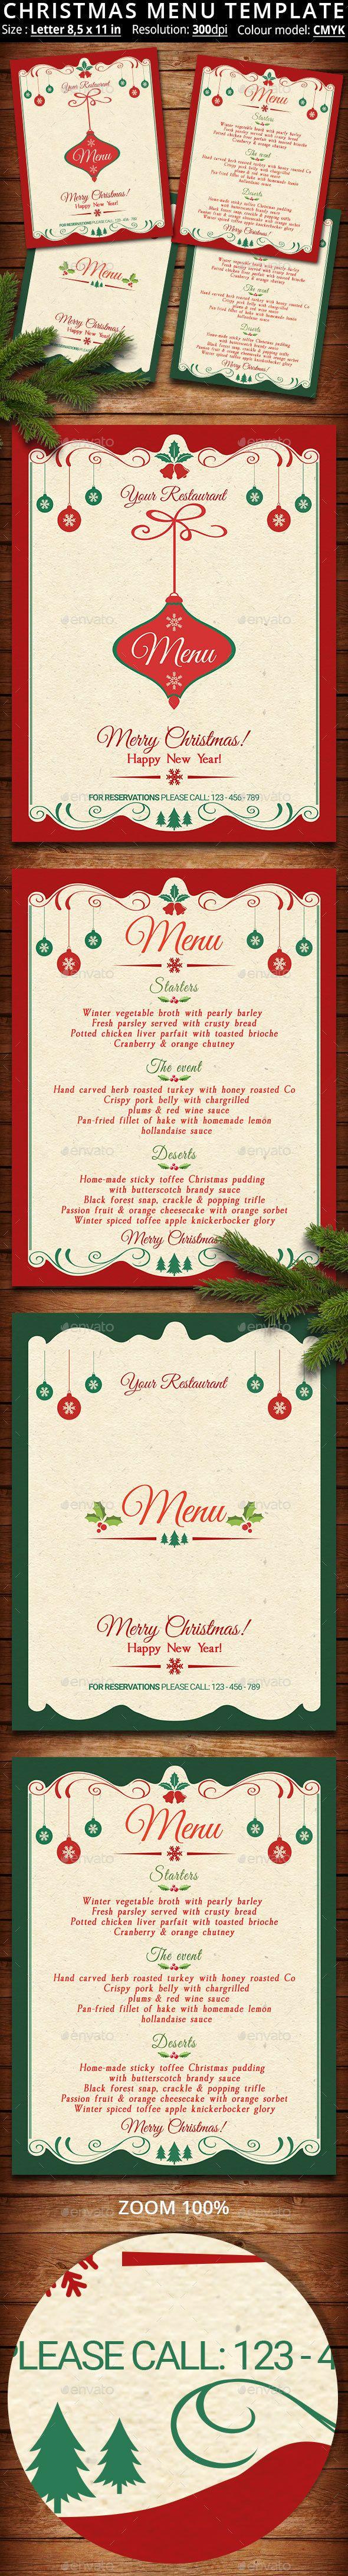 Christmas Menu Template | Navidad